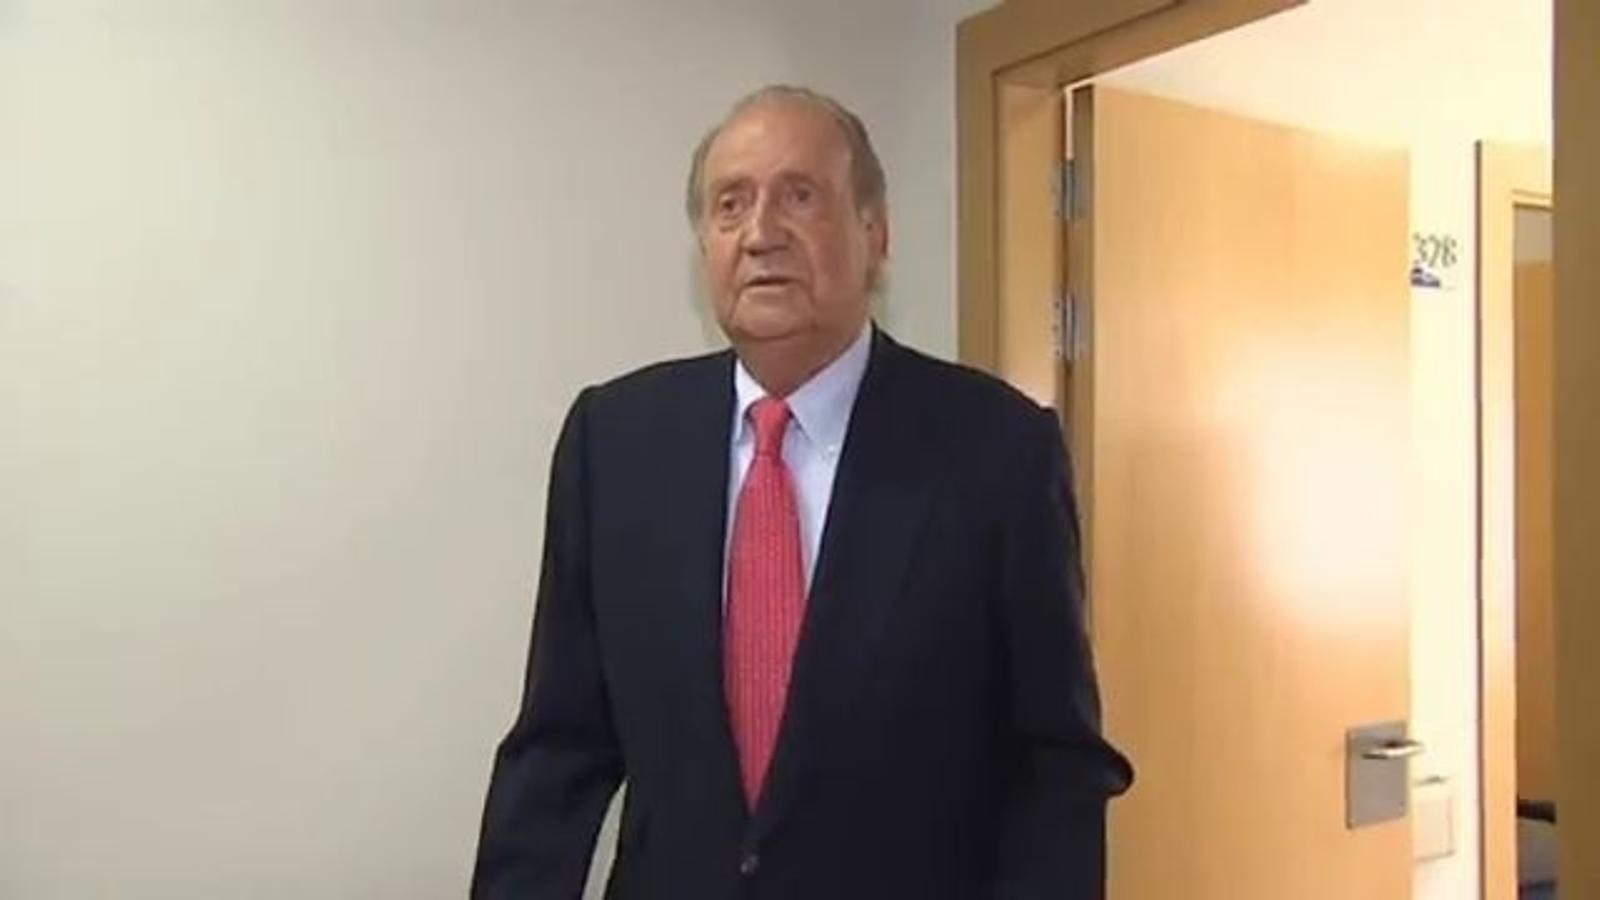 El rei Joan Carles demana disculpes pel viatge a Botswana